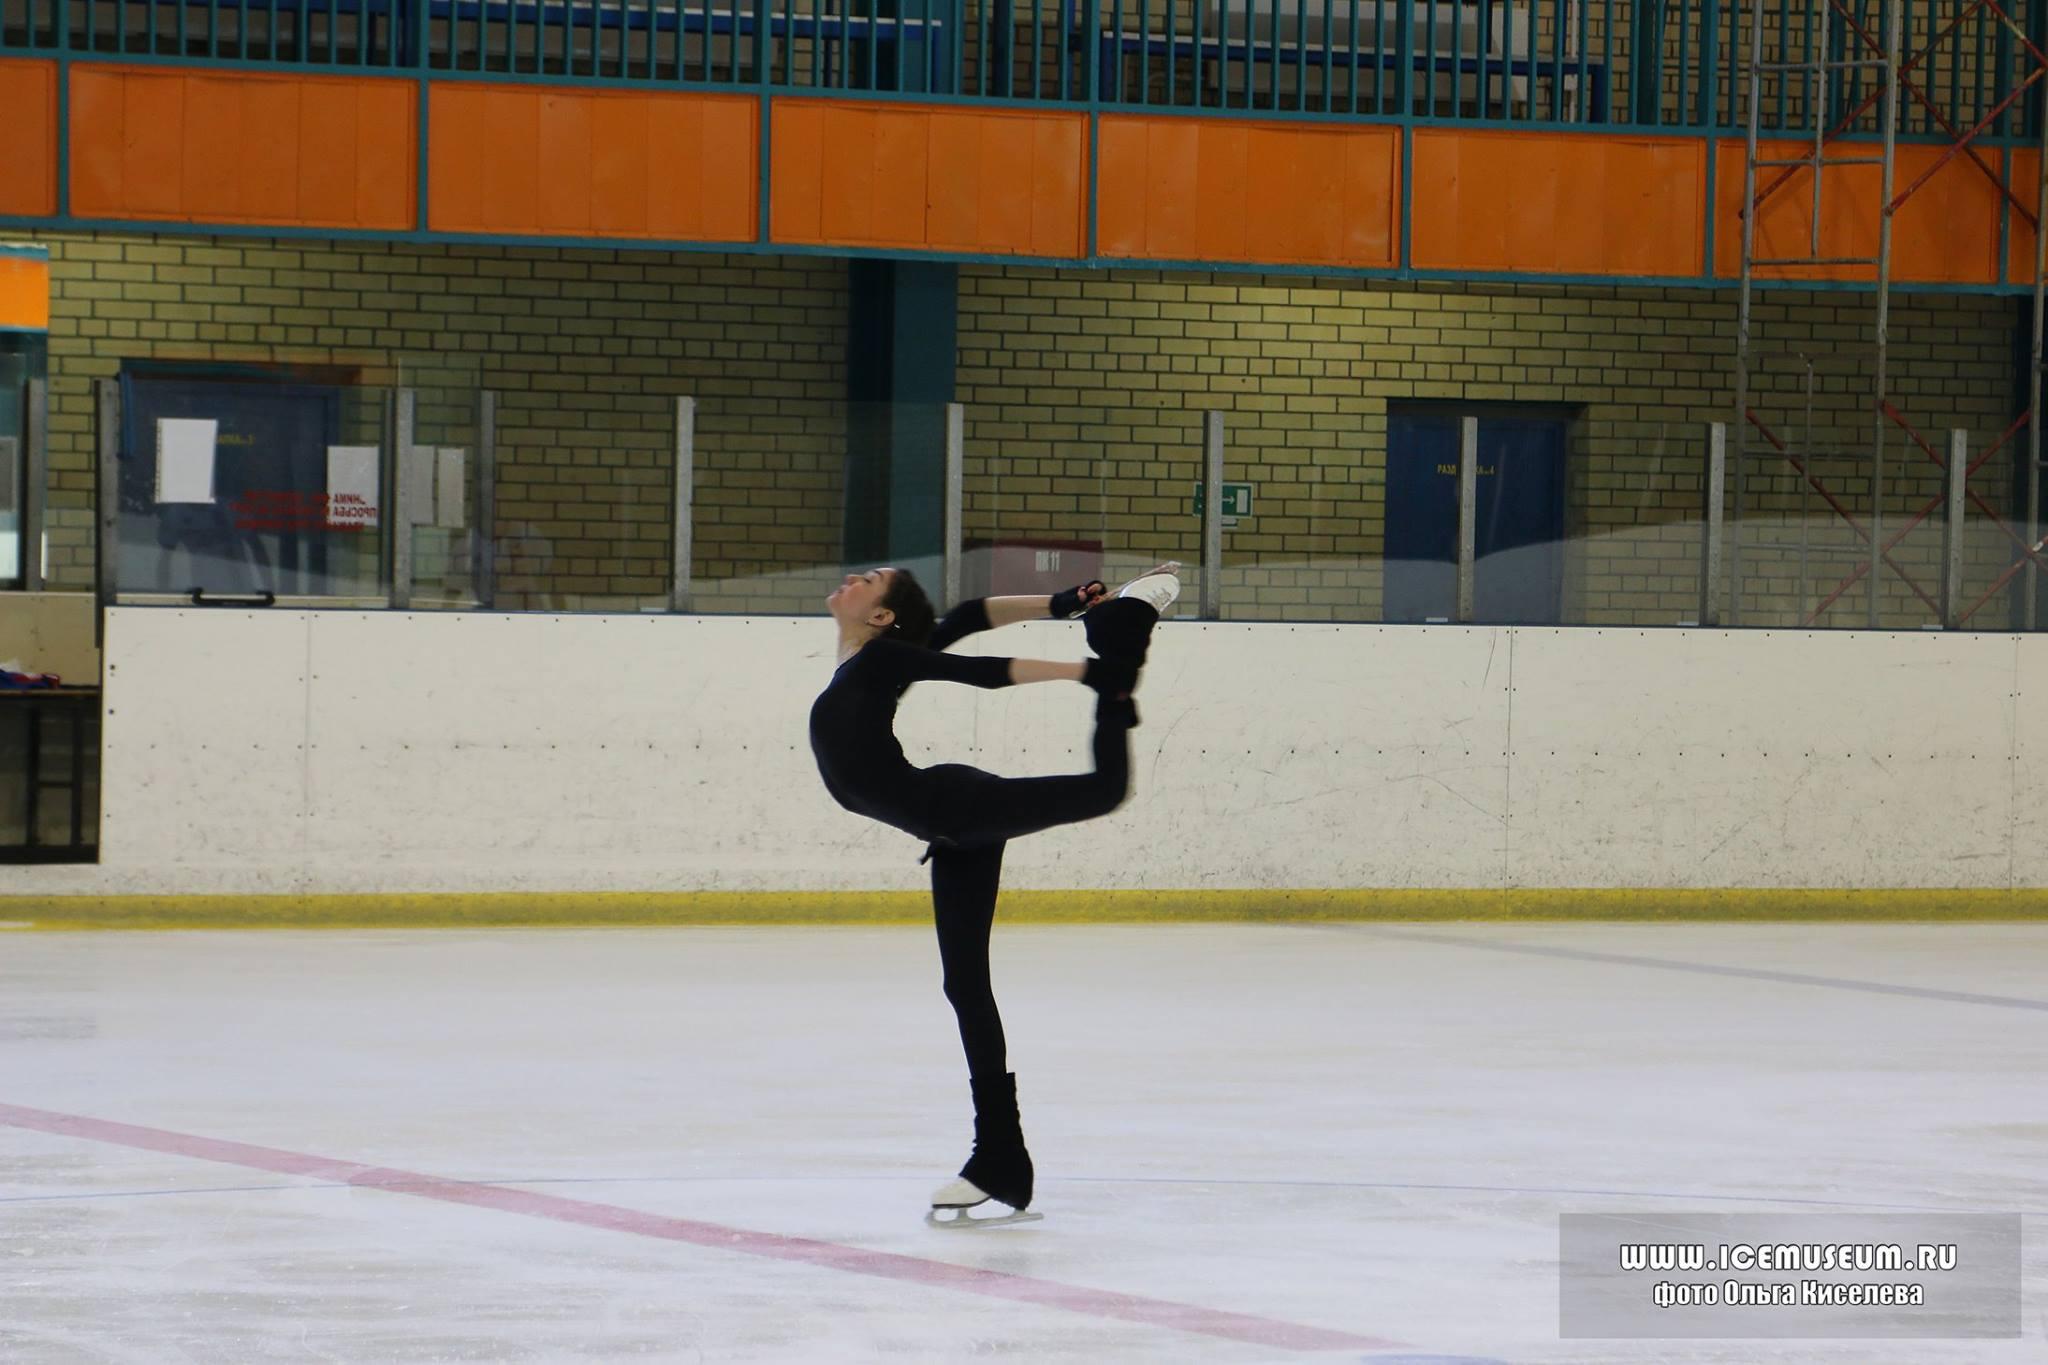 Евгения Медведева - Страница 38 9aebca5ba386